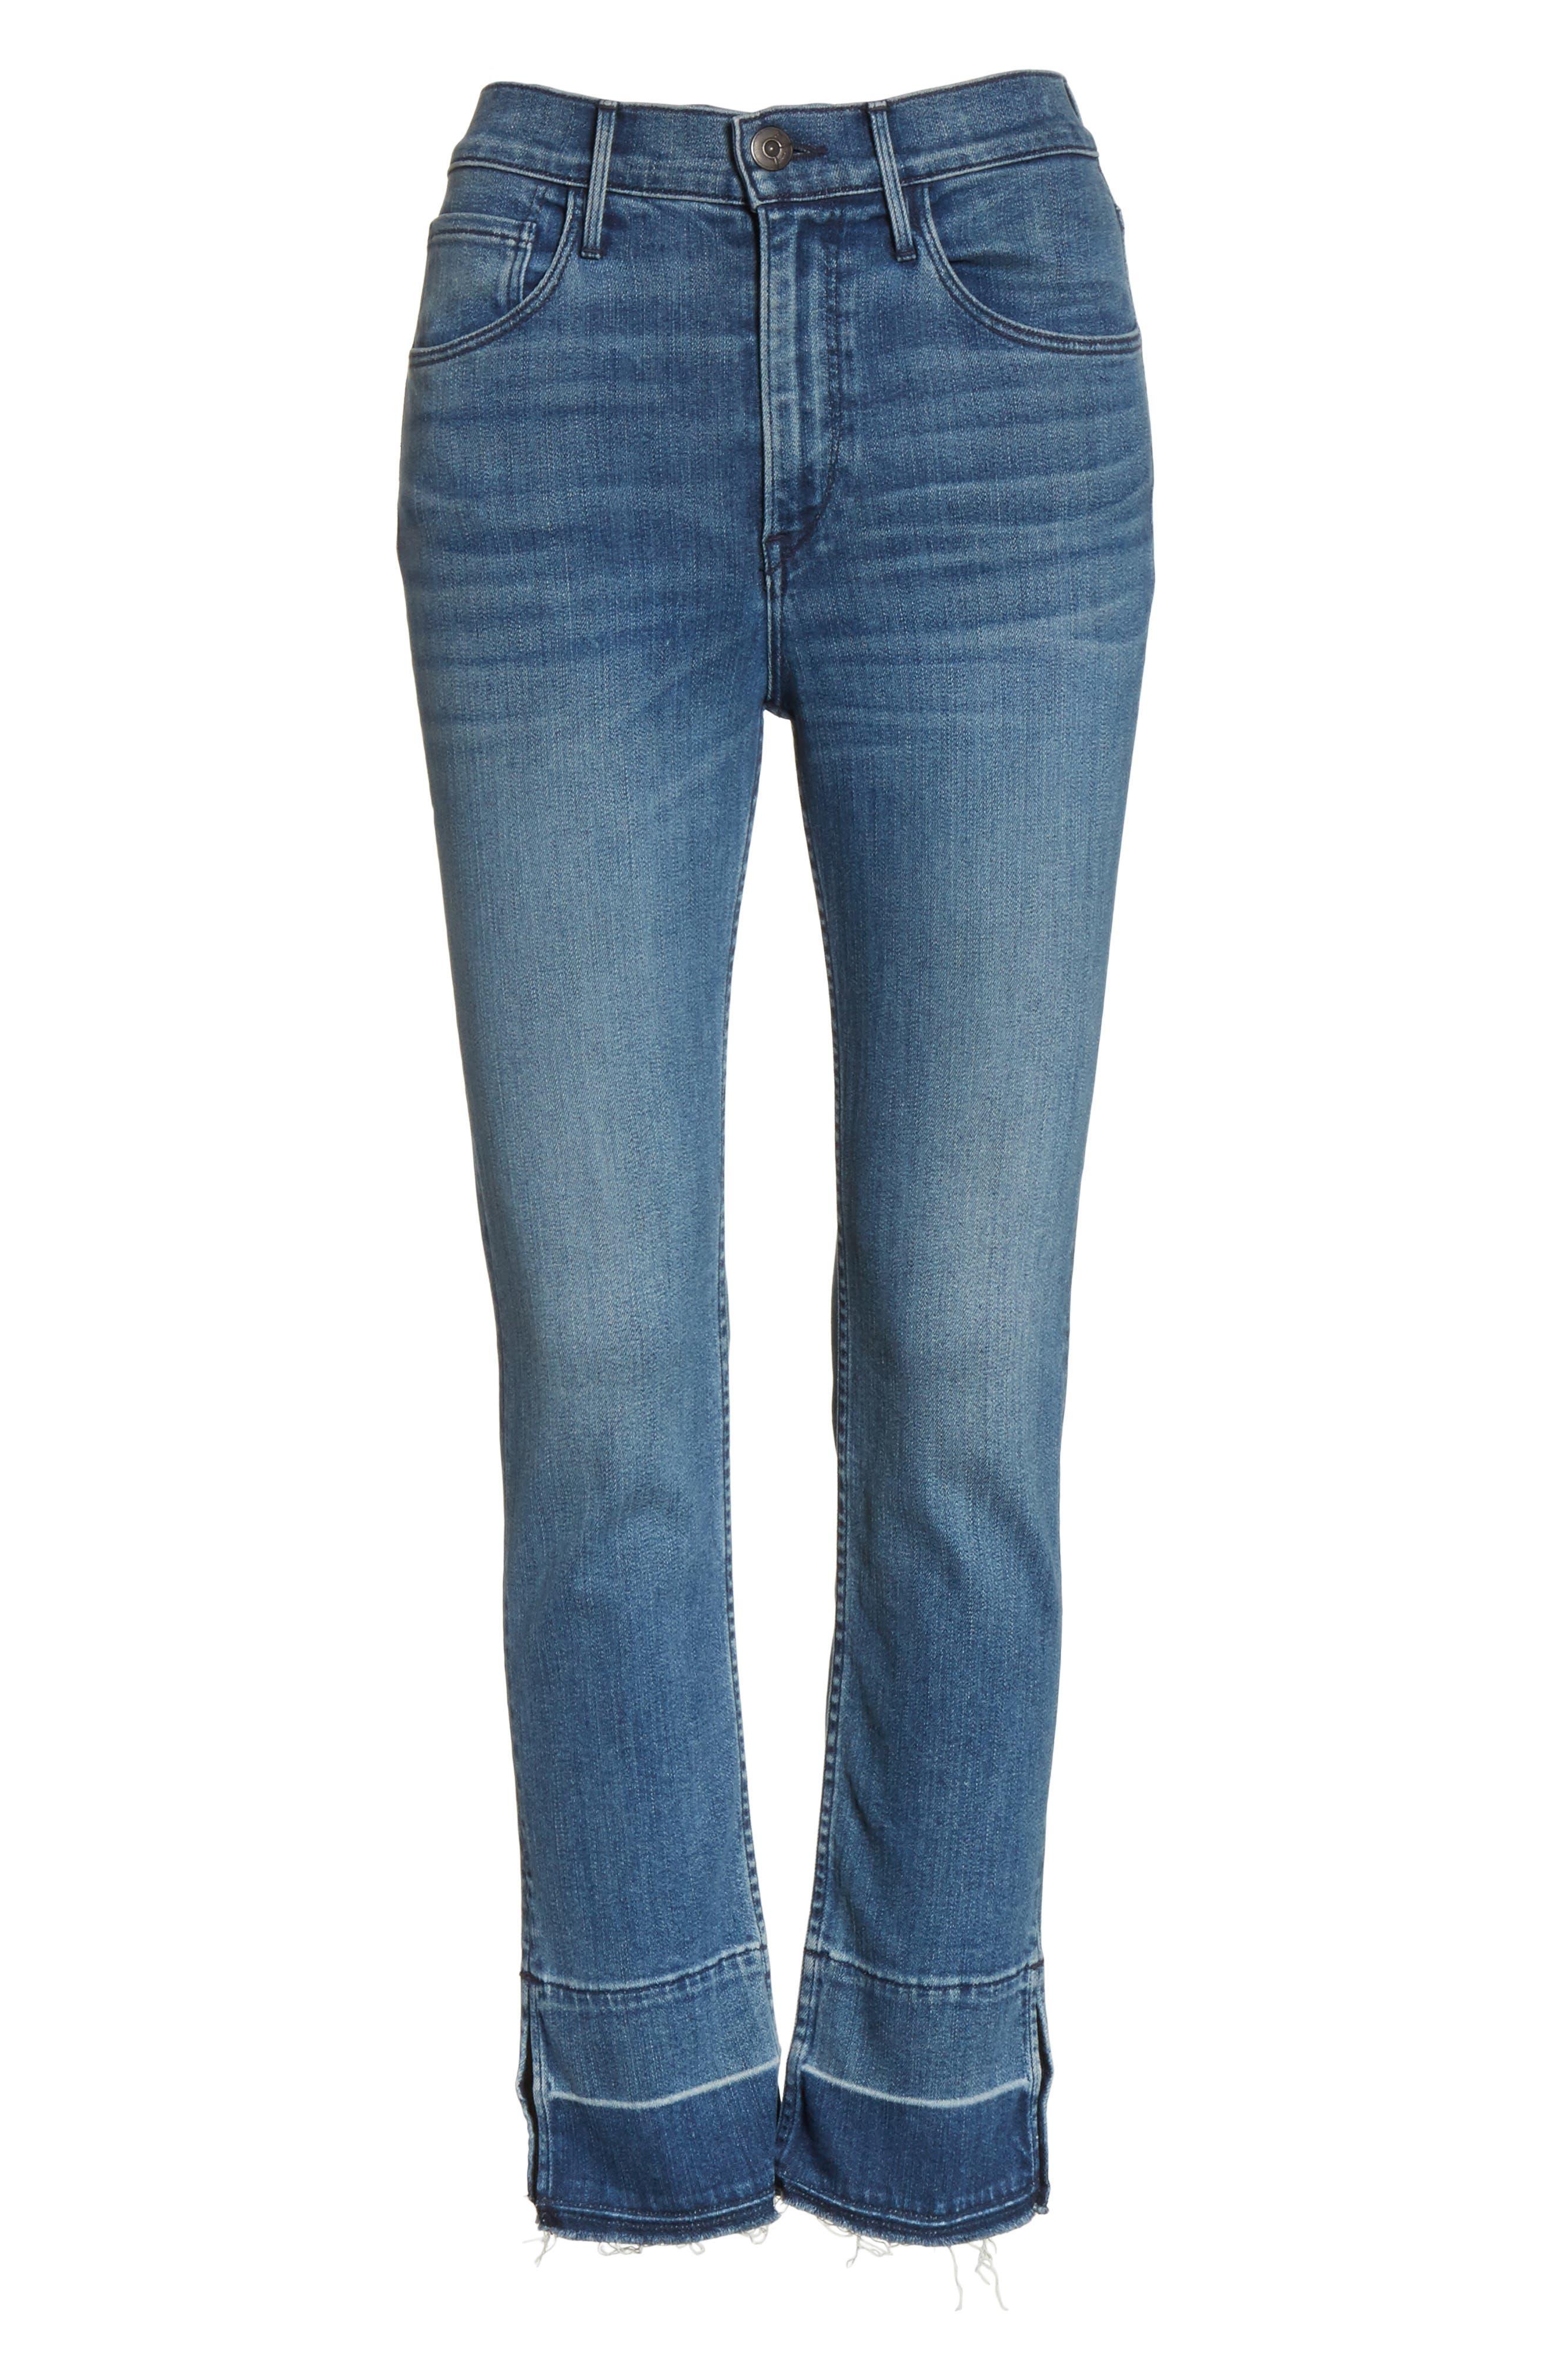 W4 Abigail Released Split Hem Ankle Skinny Jeans,                             Alternate thumbnail 6, color,                             Ady